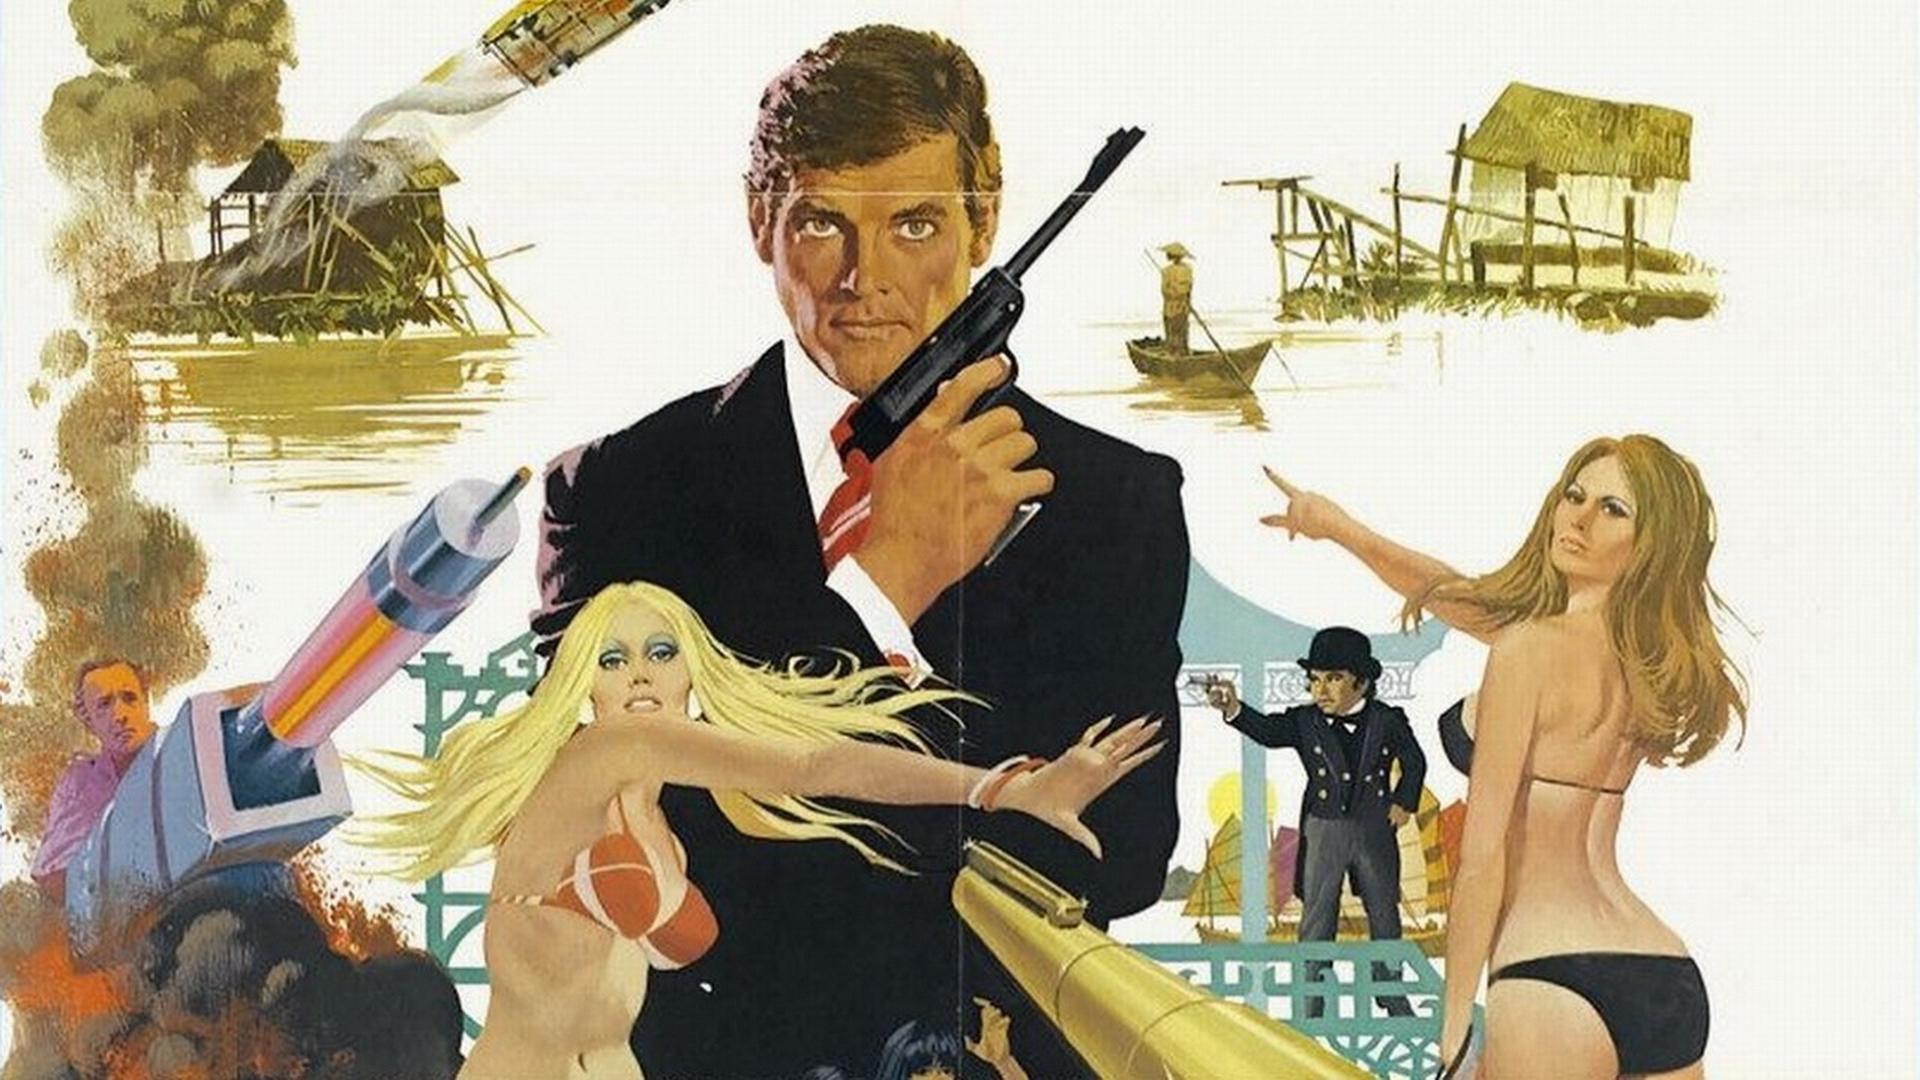 James Bond Wallpaper Hd 1080p 4 HD Desktop Wallpapers 1920x1080